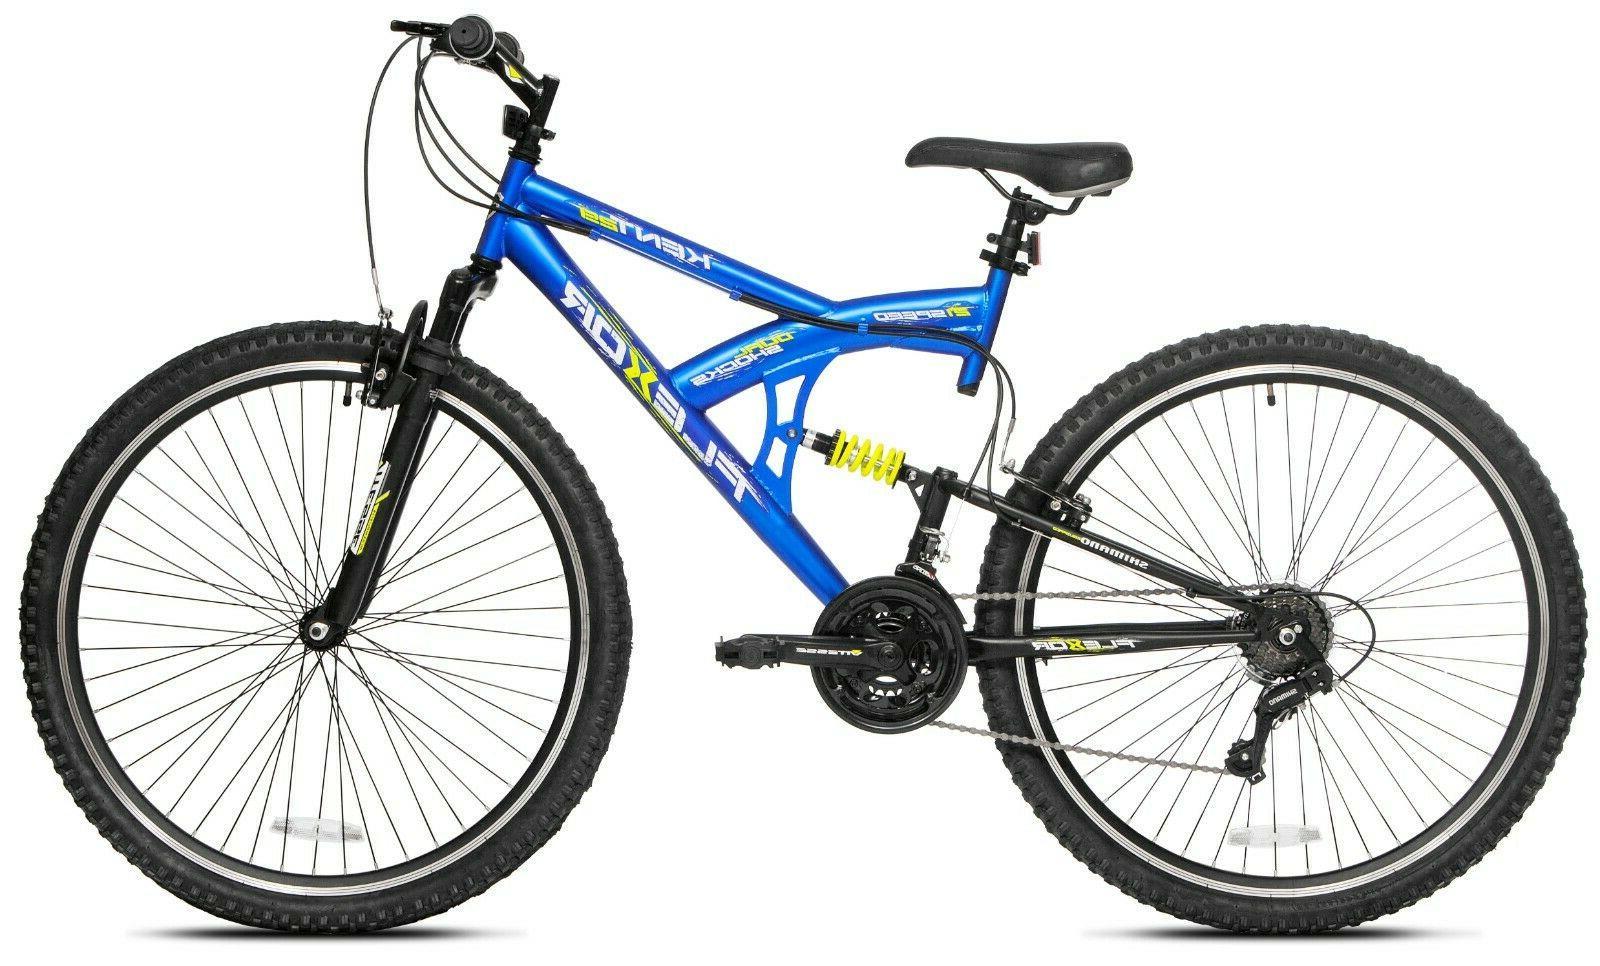 Kent Flexor Dual Suspension Mountain Bike Bicycle